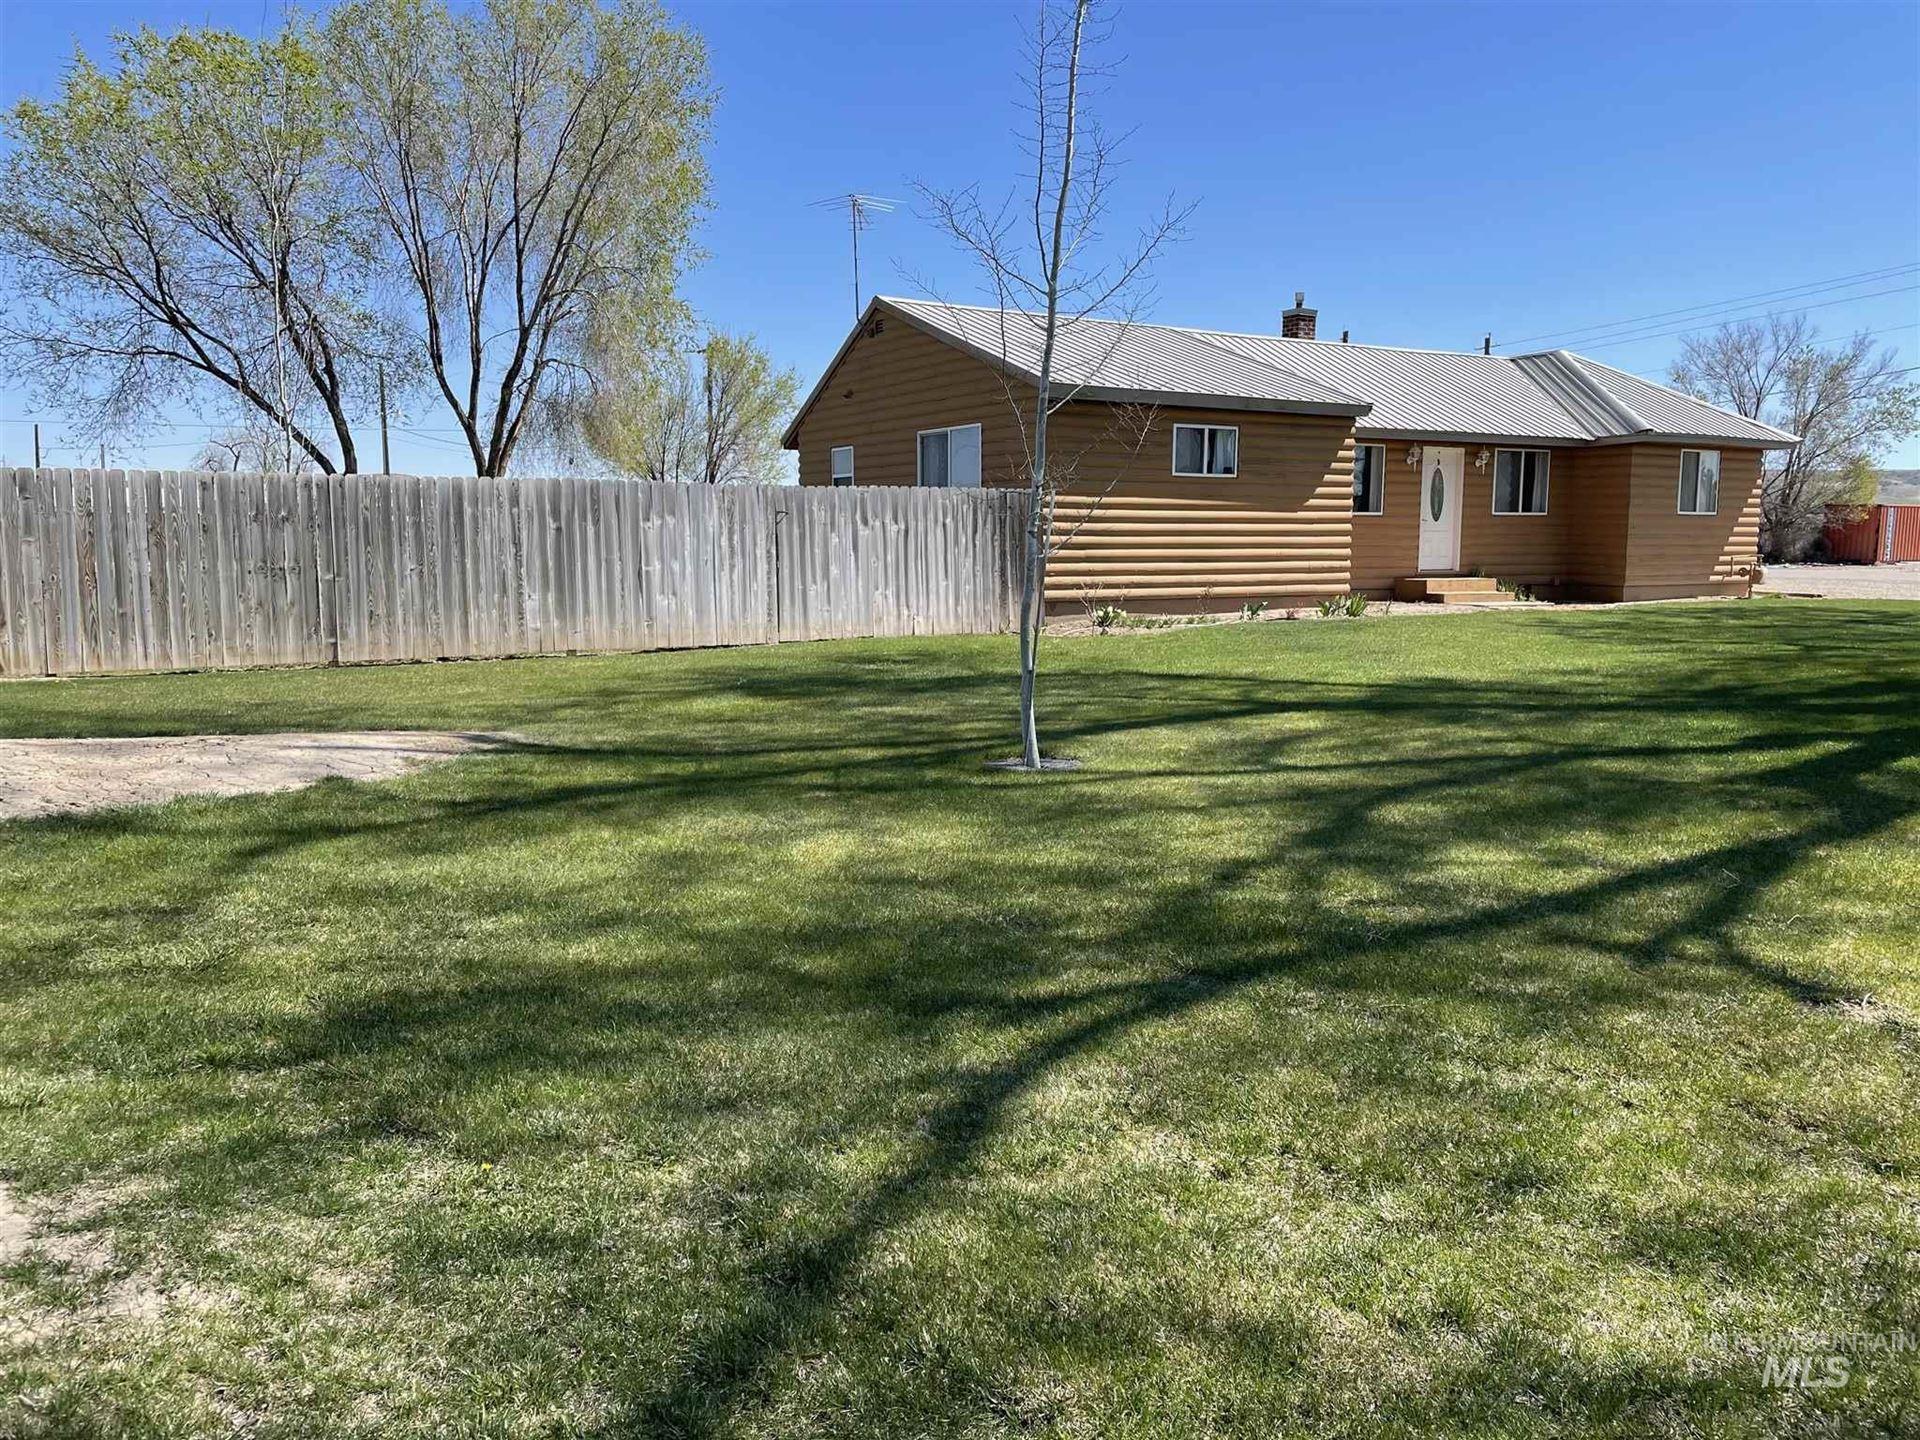 Photo of 10010 N Iowa Ave, Payette, ID 83661 (MLS # 98799146)